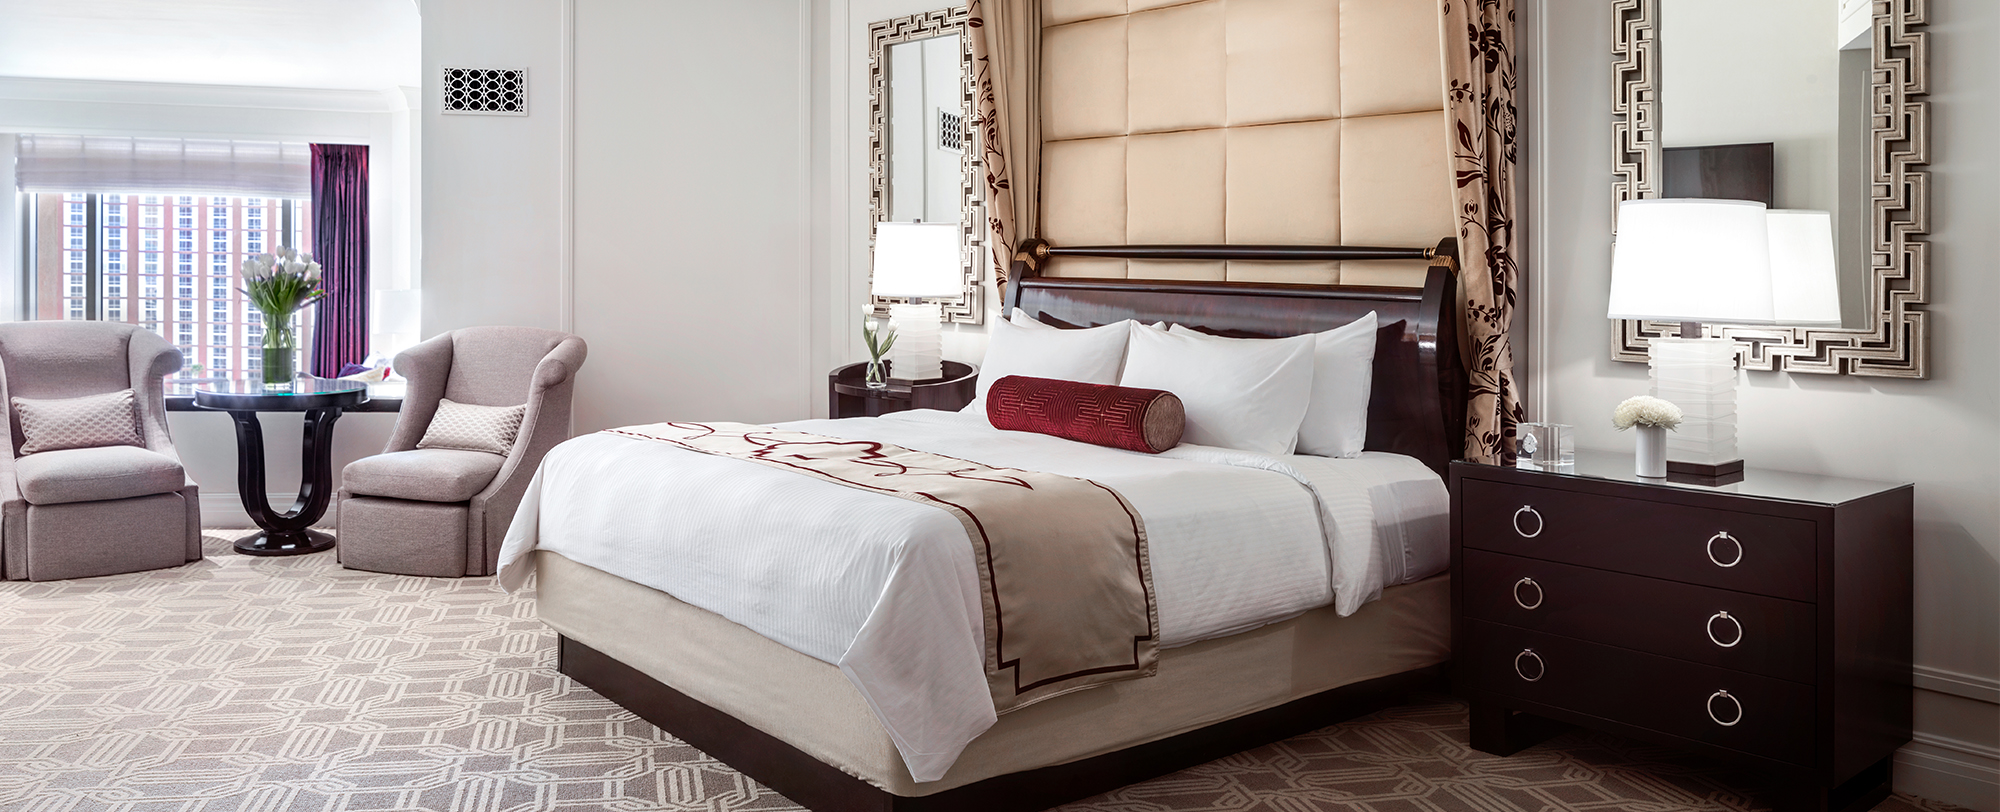 Amber Nevada Wiki the venetian® resort las vegas | luxury hotels in las vegas